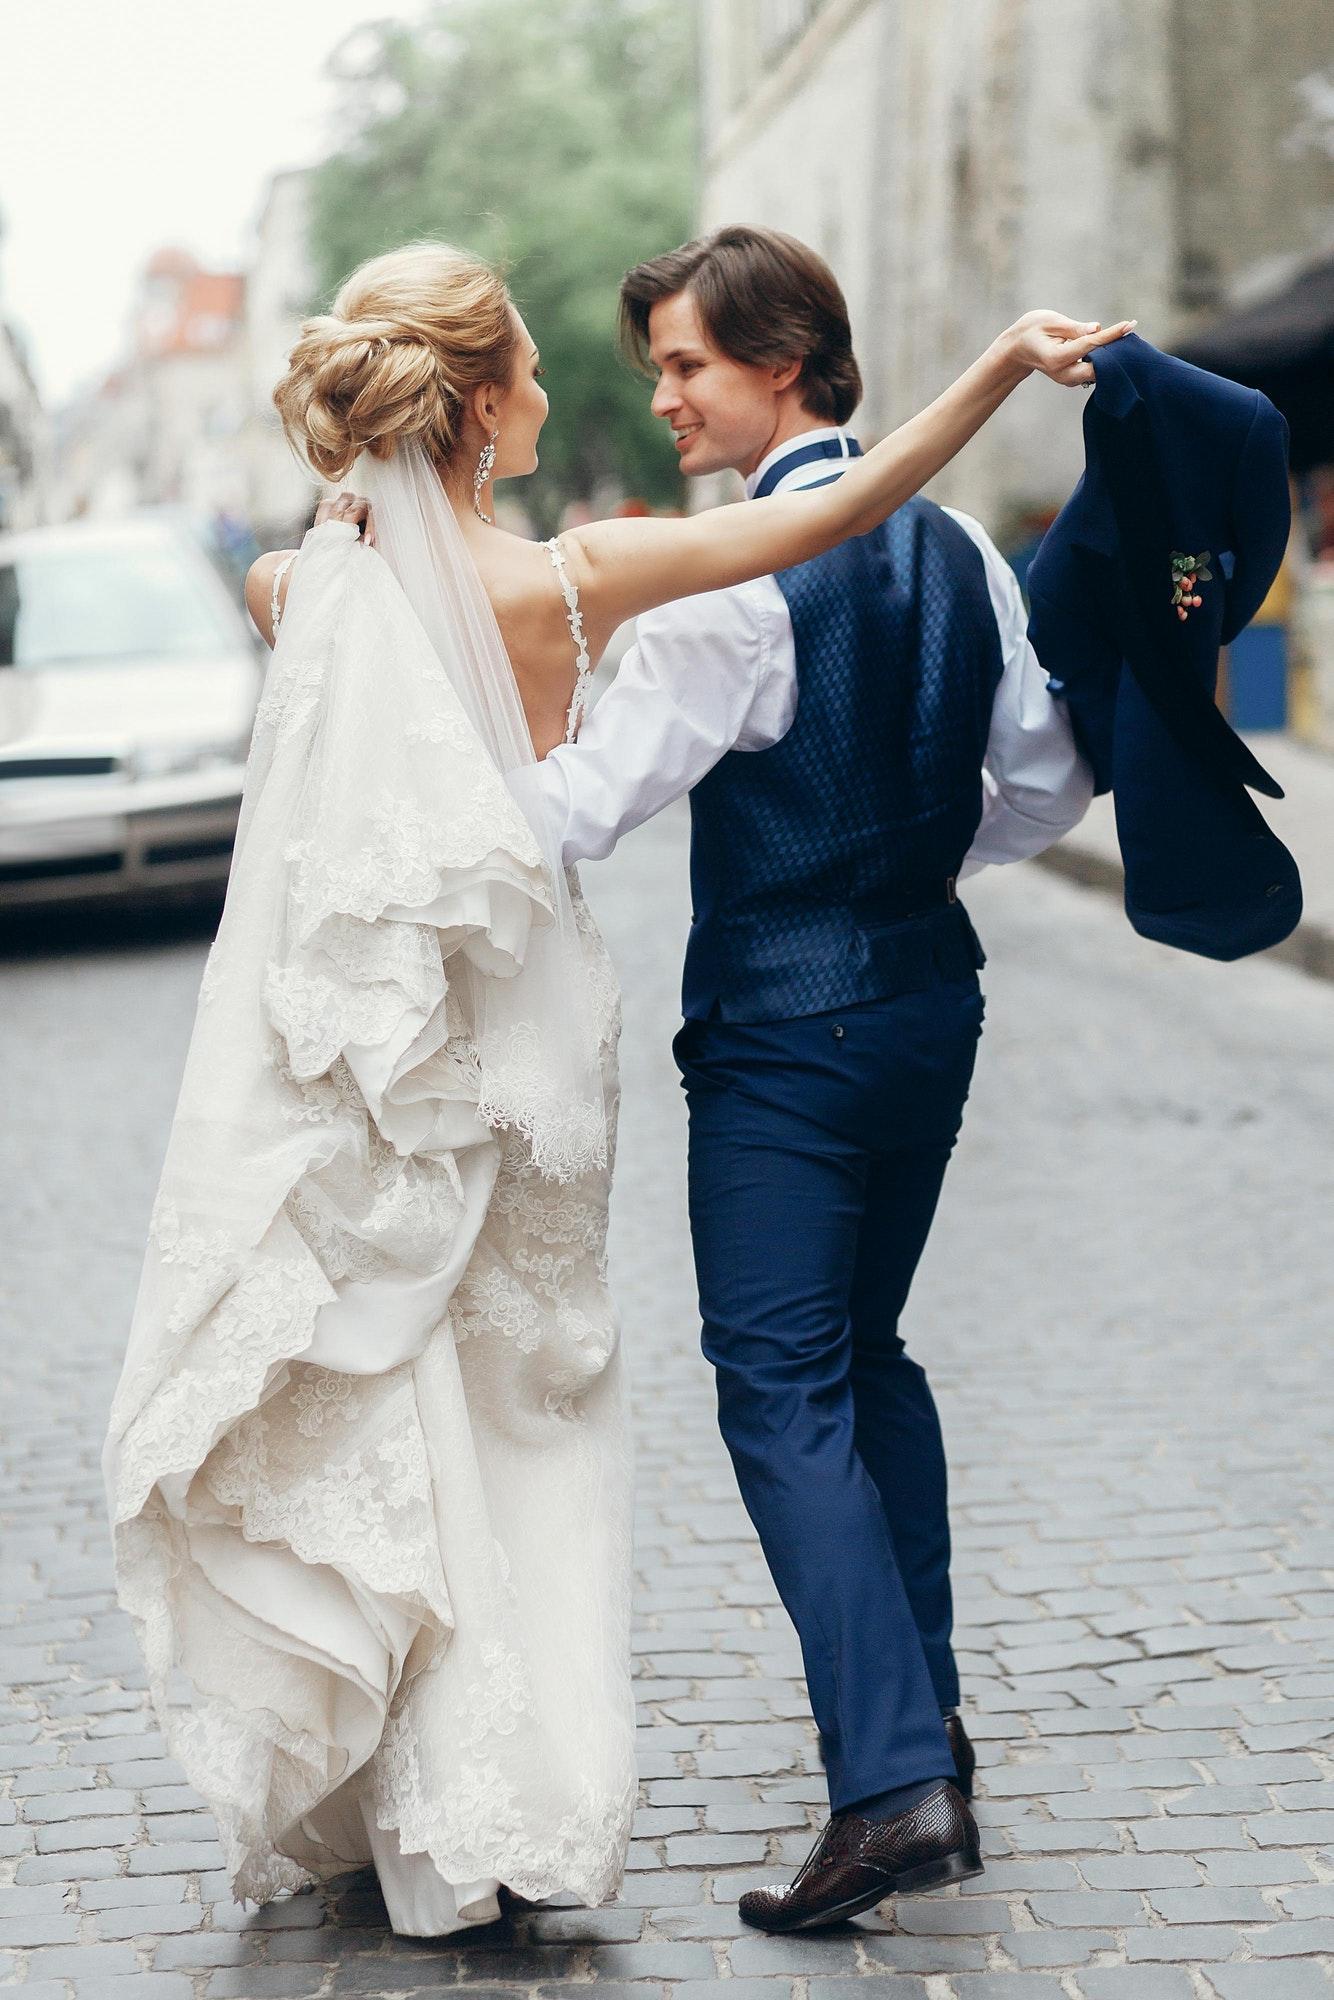 Bride and groom dancing and having fun in city street.